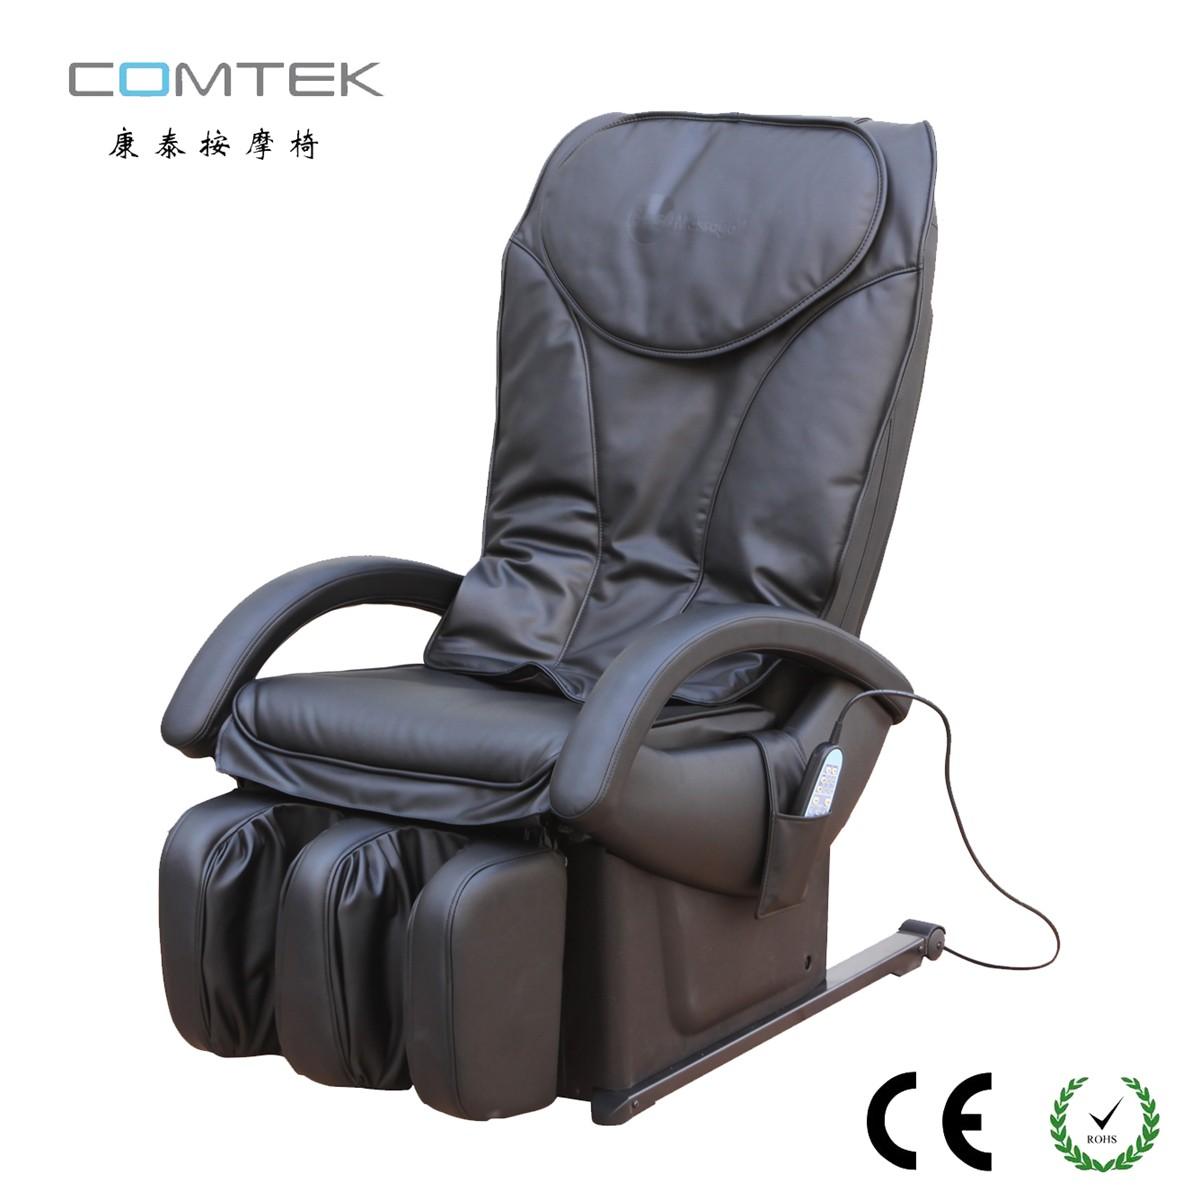 comtek massage chair stuffed animal chairs healthy purchasing souring agent ecvv com